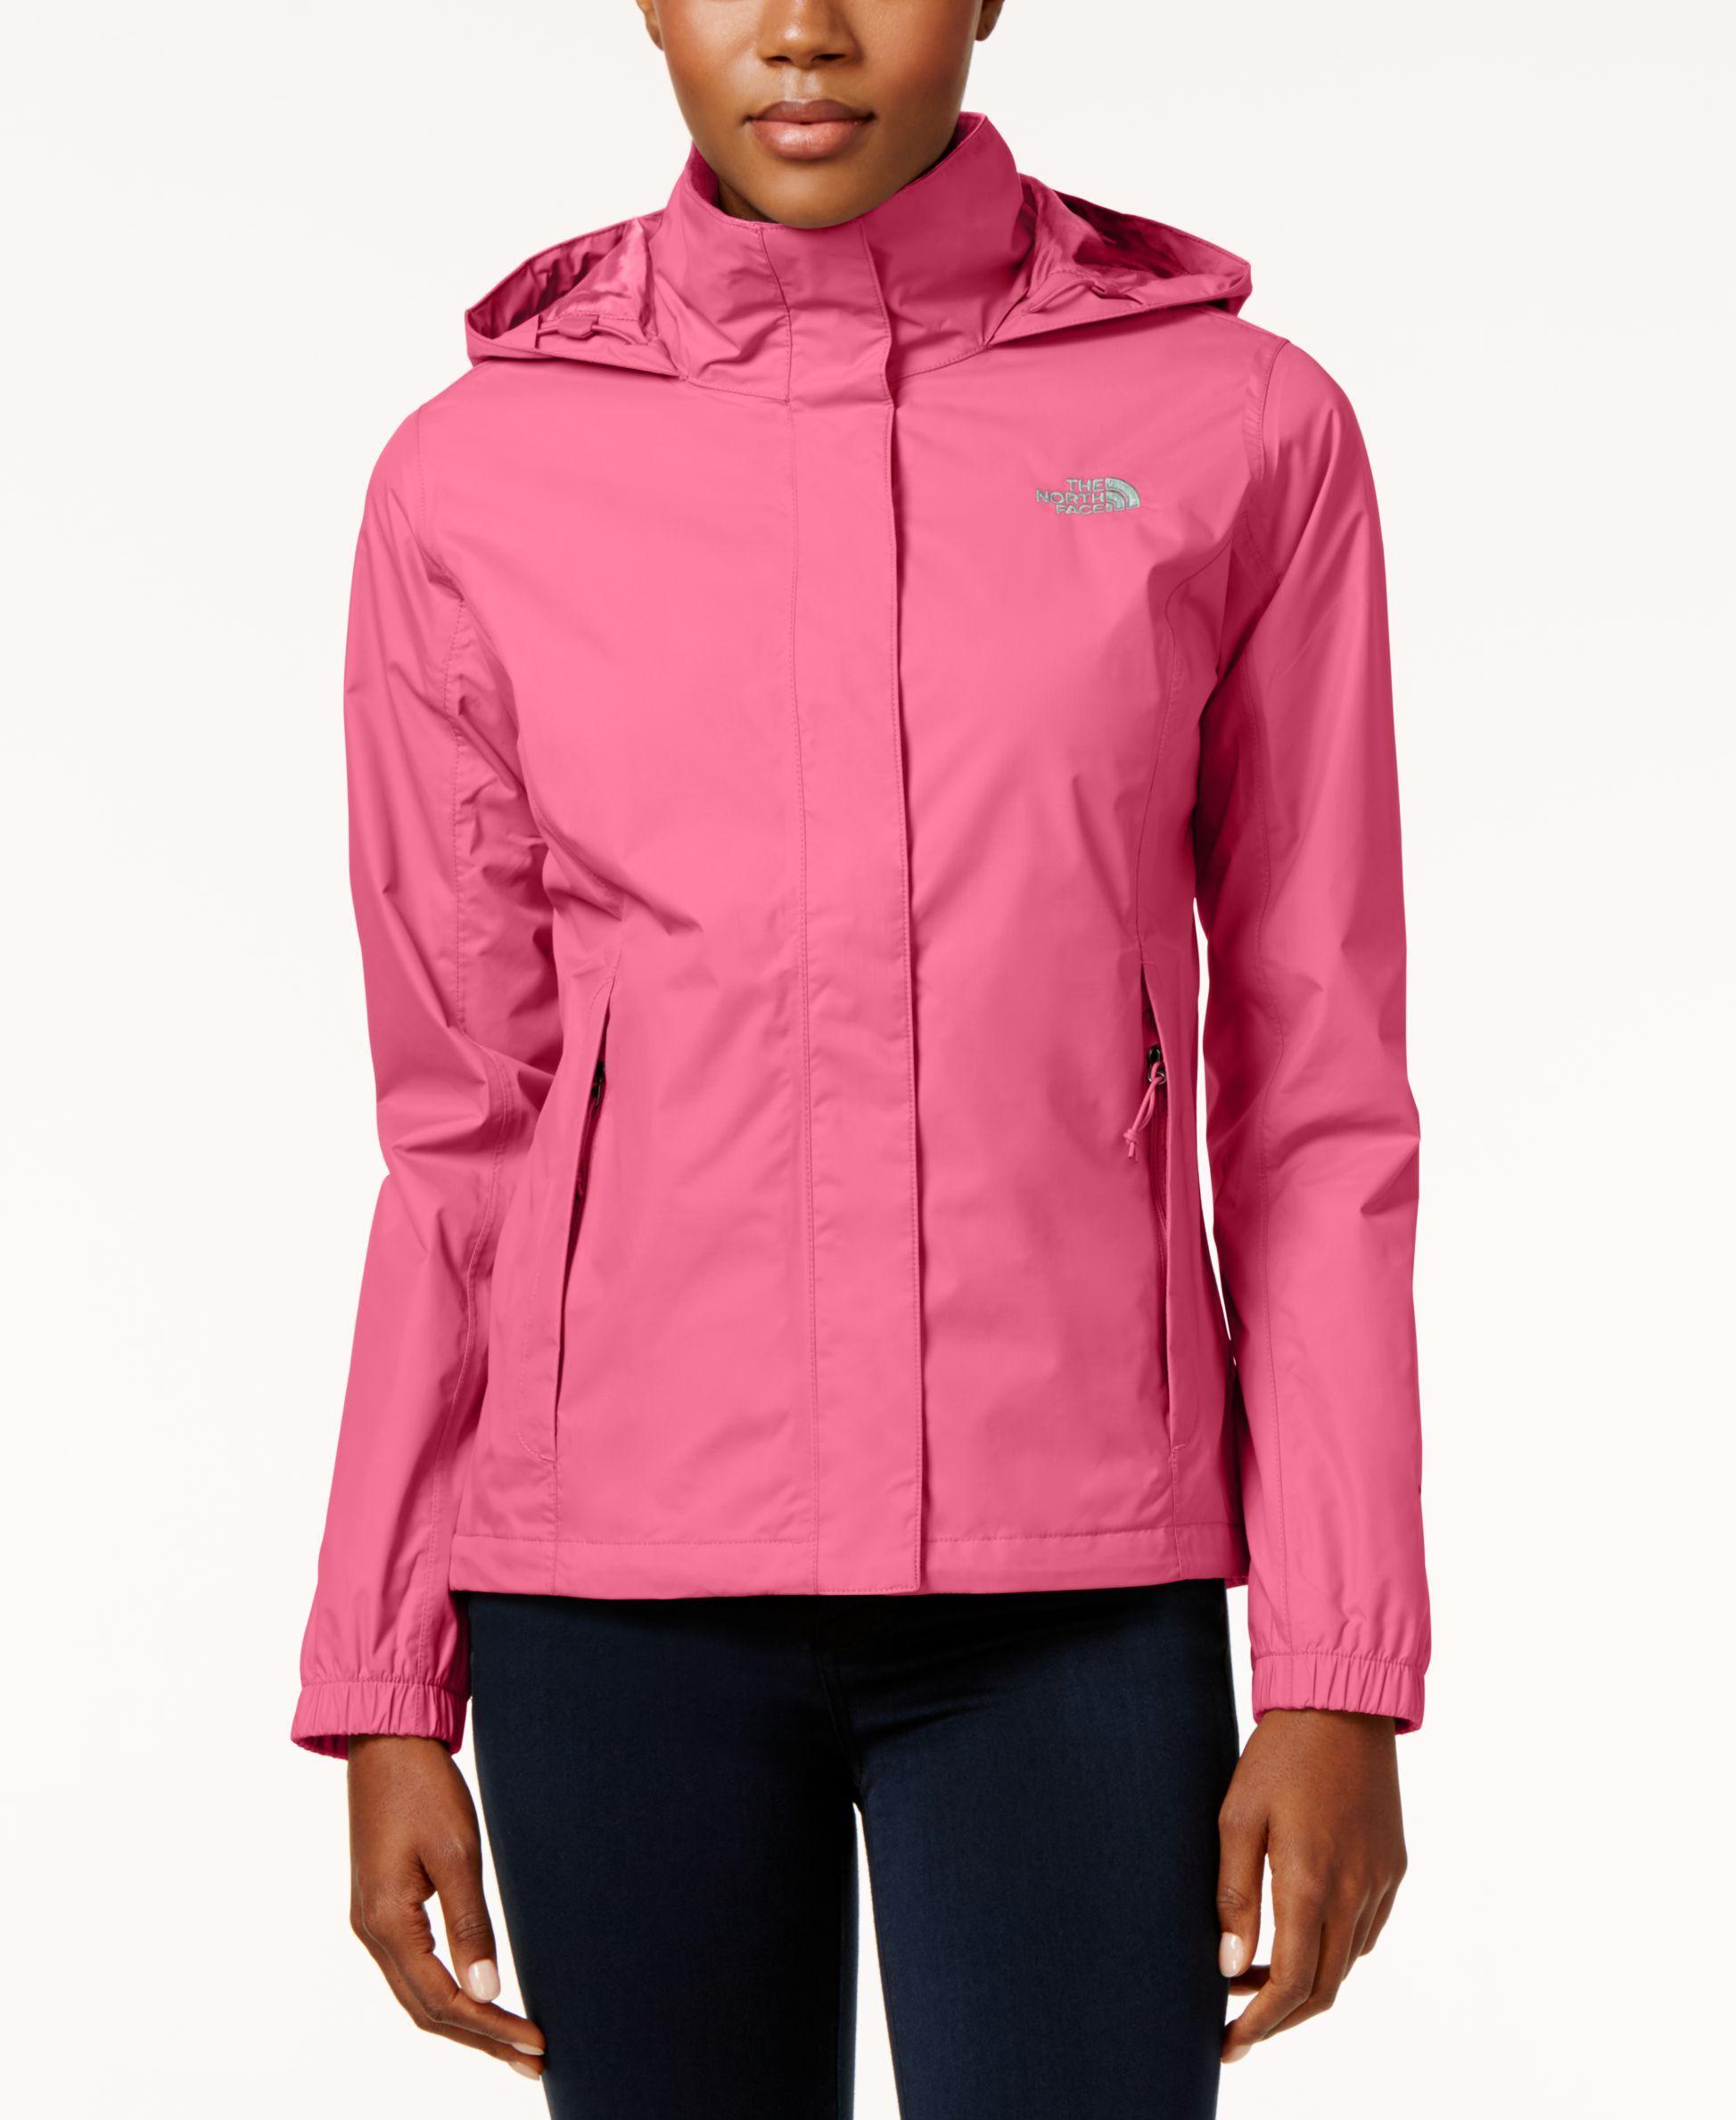 2b963b62351 Resolve 2 Waterproof Rain Jacket | Products | Waterproof rain jacket ...